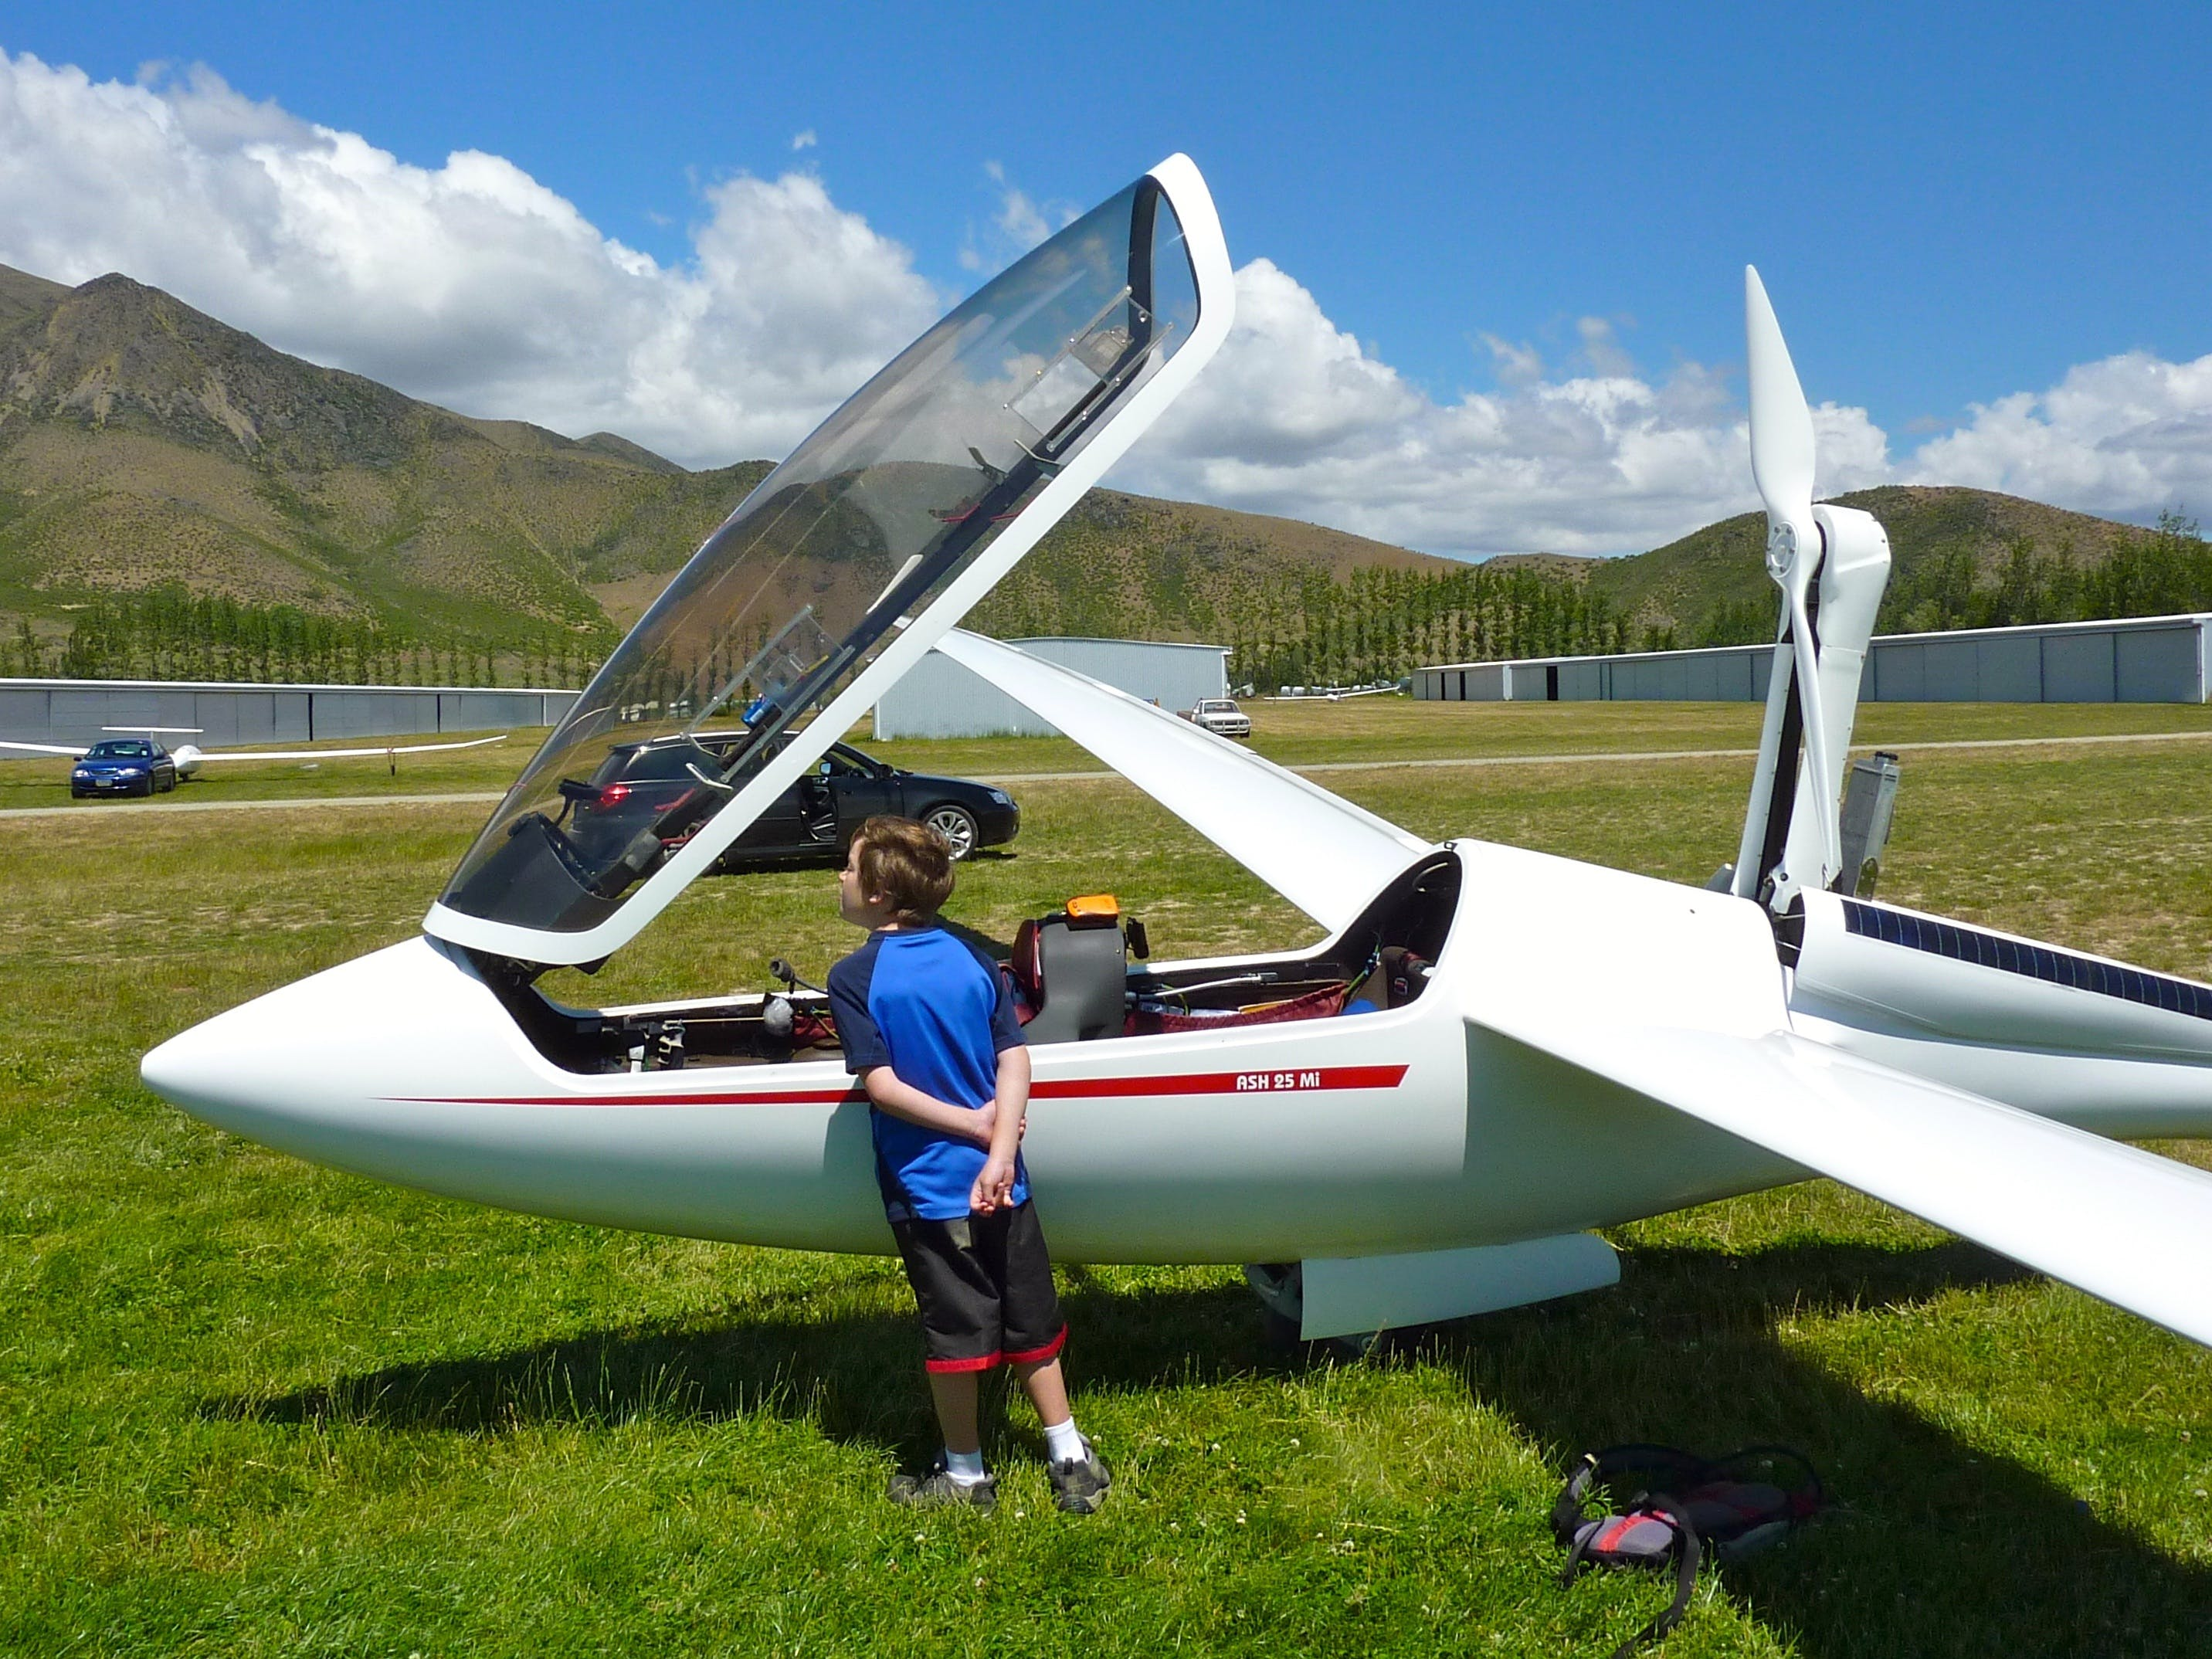 aeroplane, aircraft, airplane